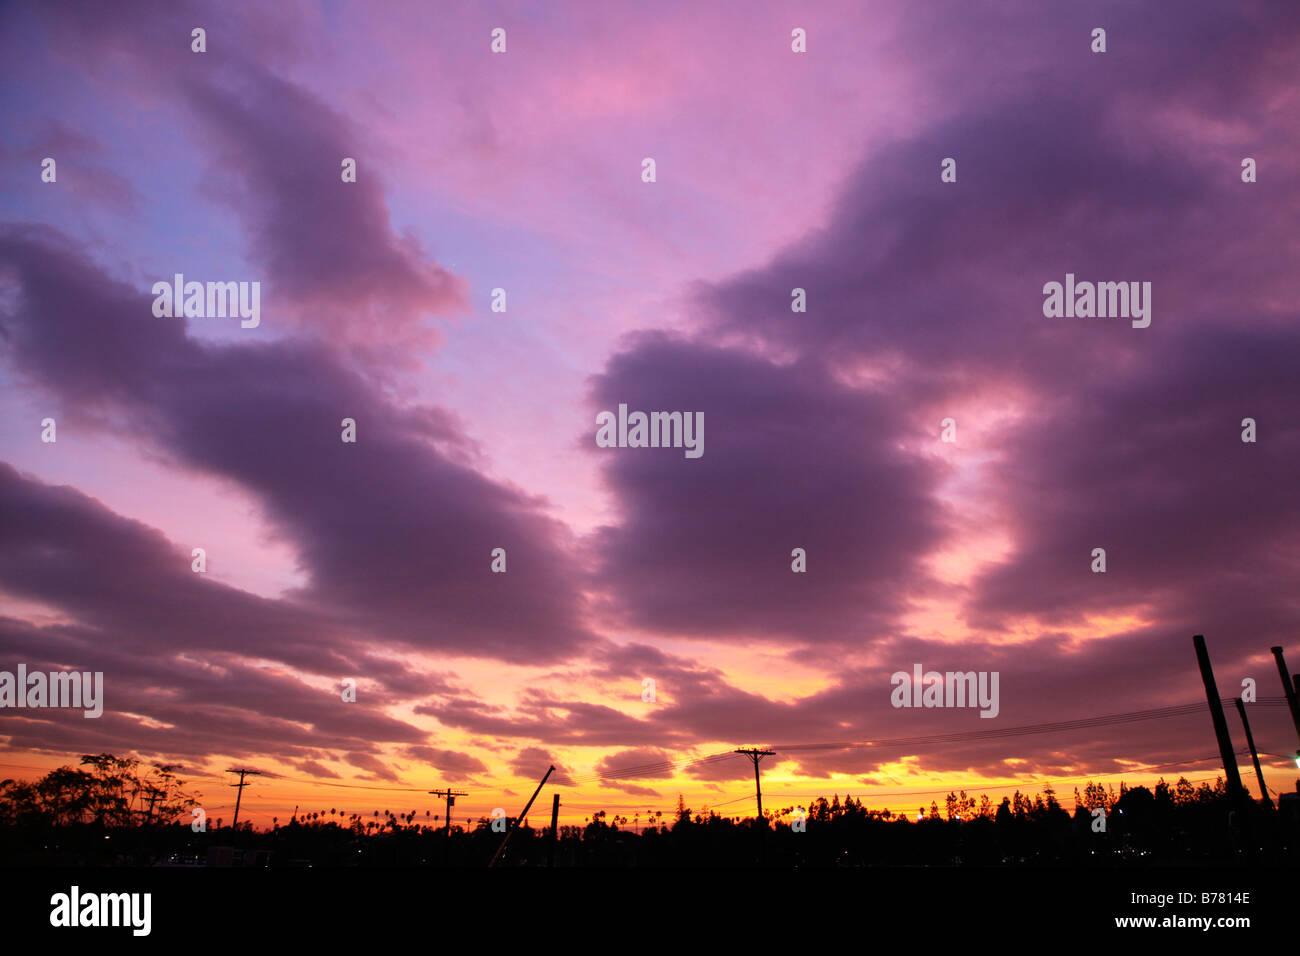 sunset purple clouds telephone poles silhouette big sky dramatic sky weather - Stock Image